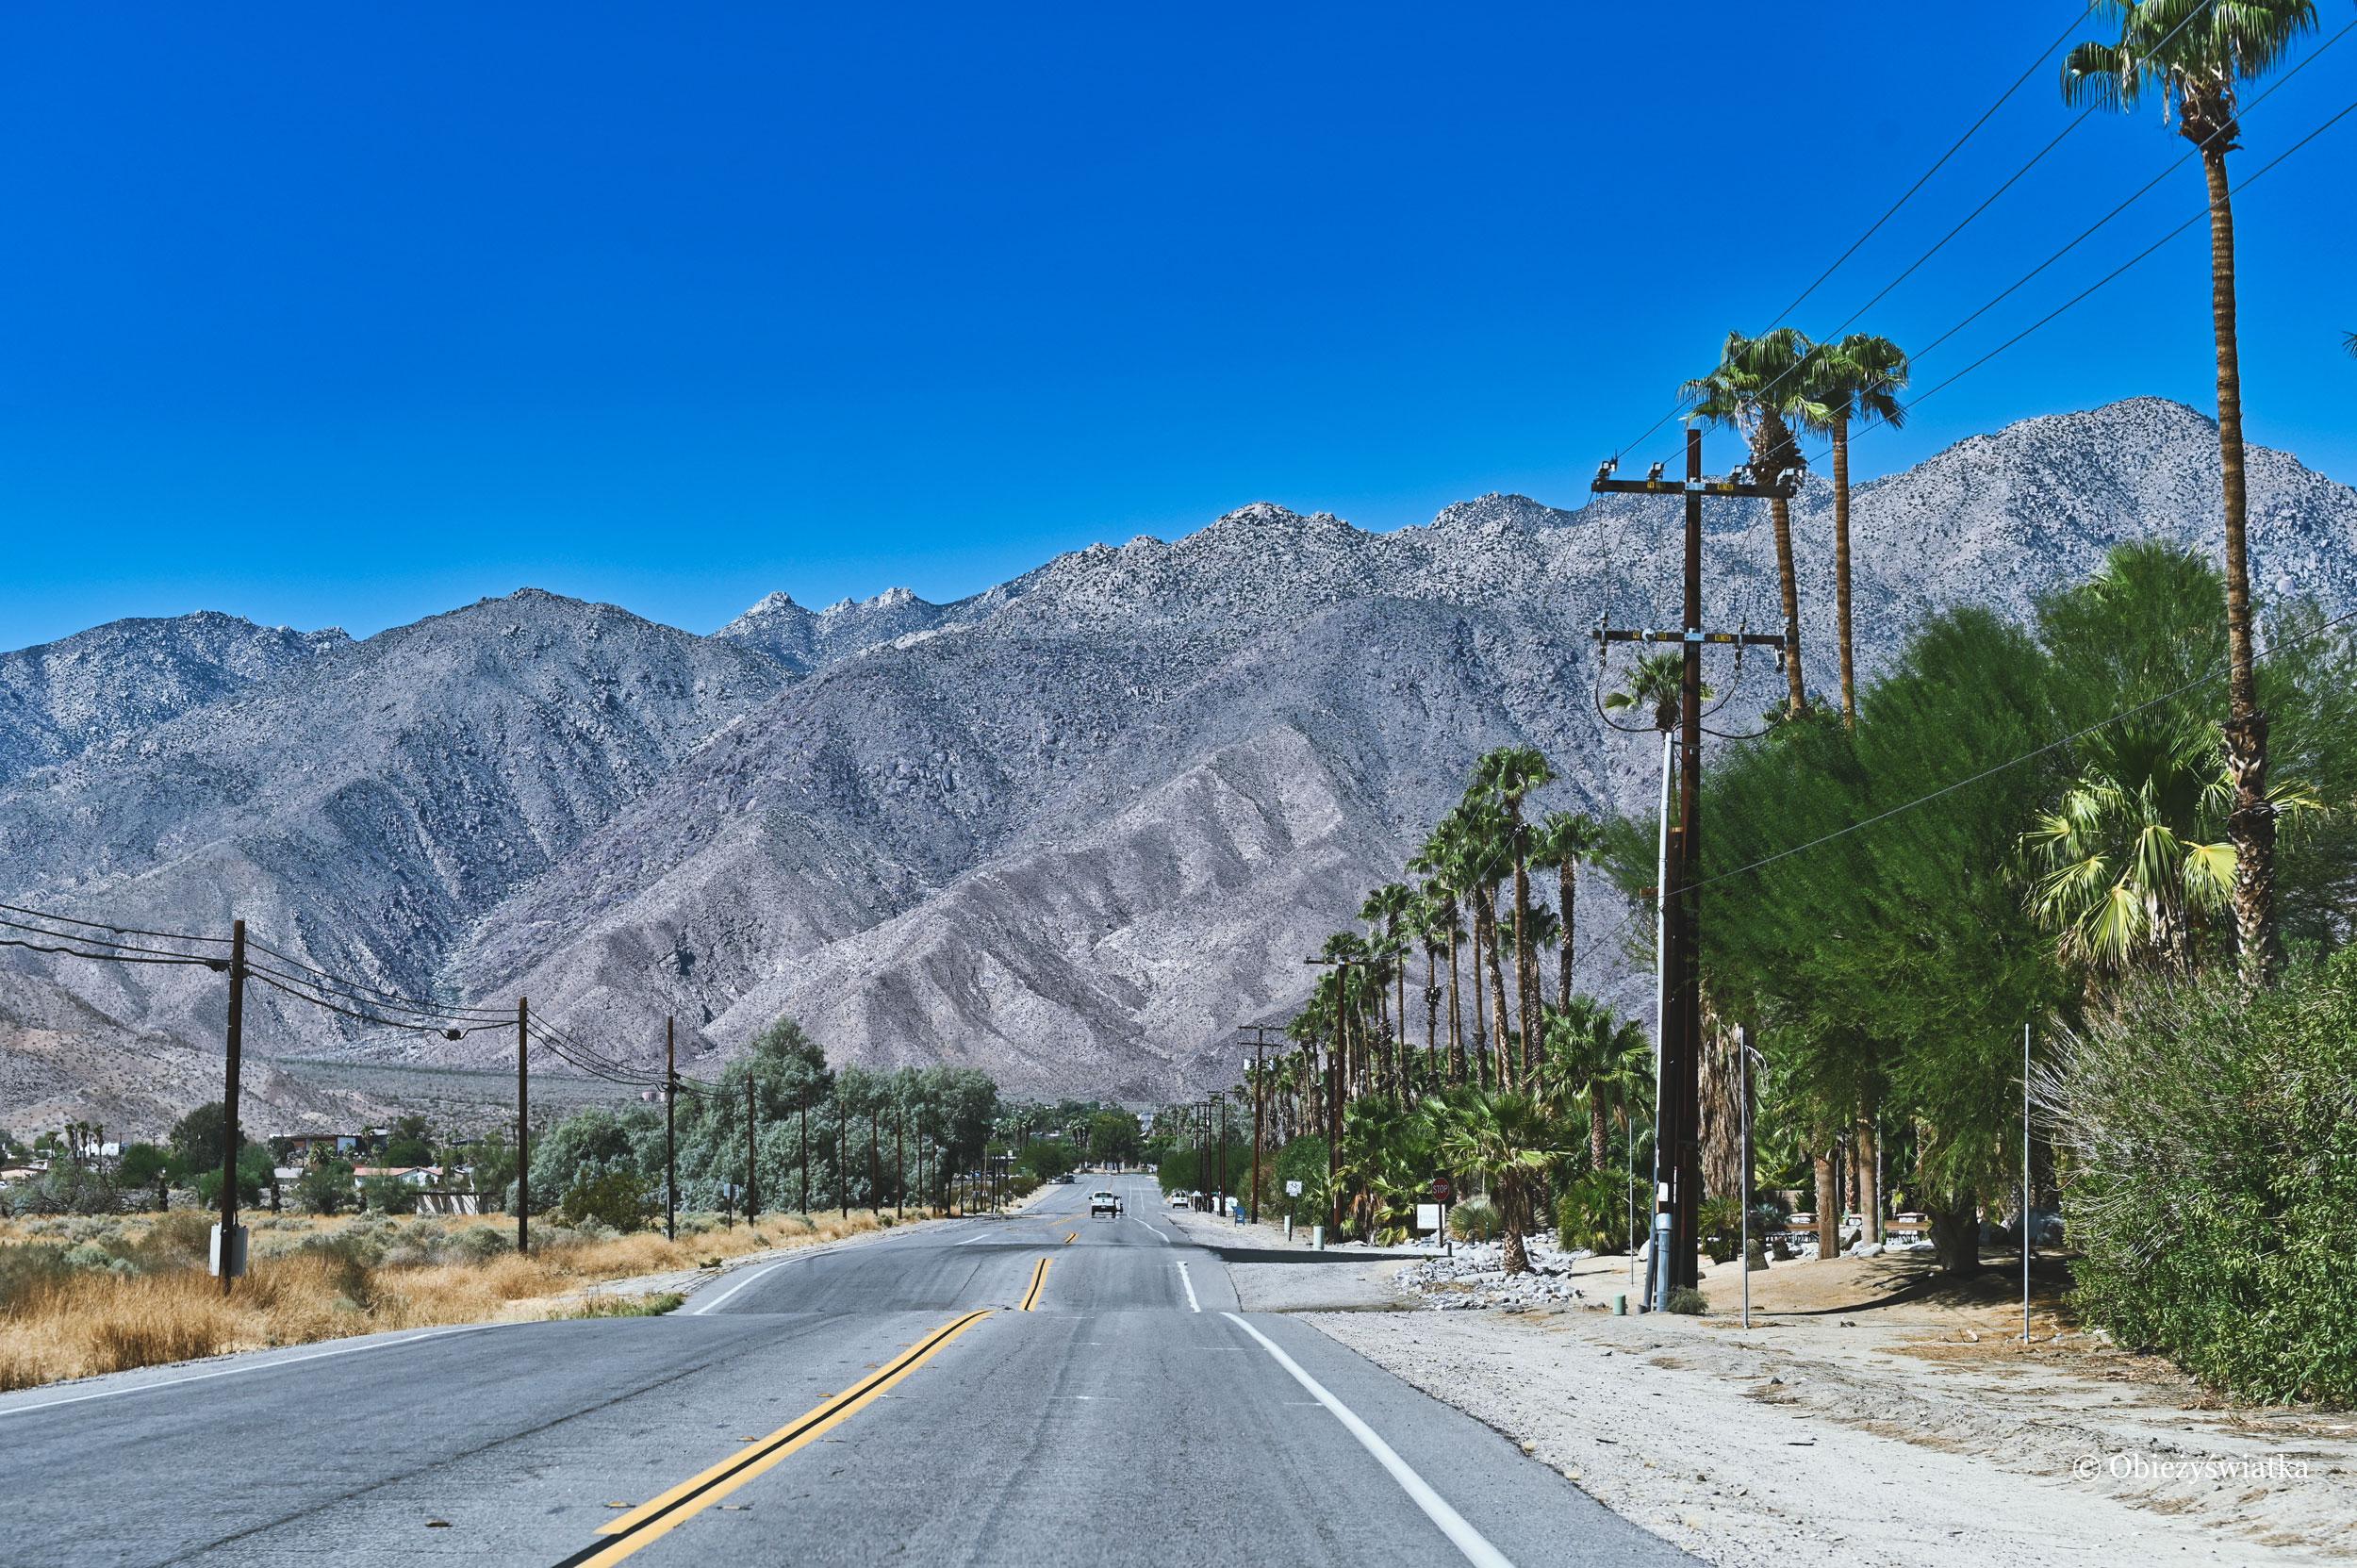 Palmy i góry - Borrego Springs, Kalifornia